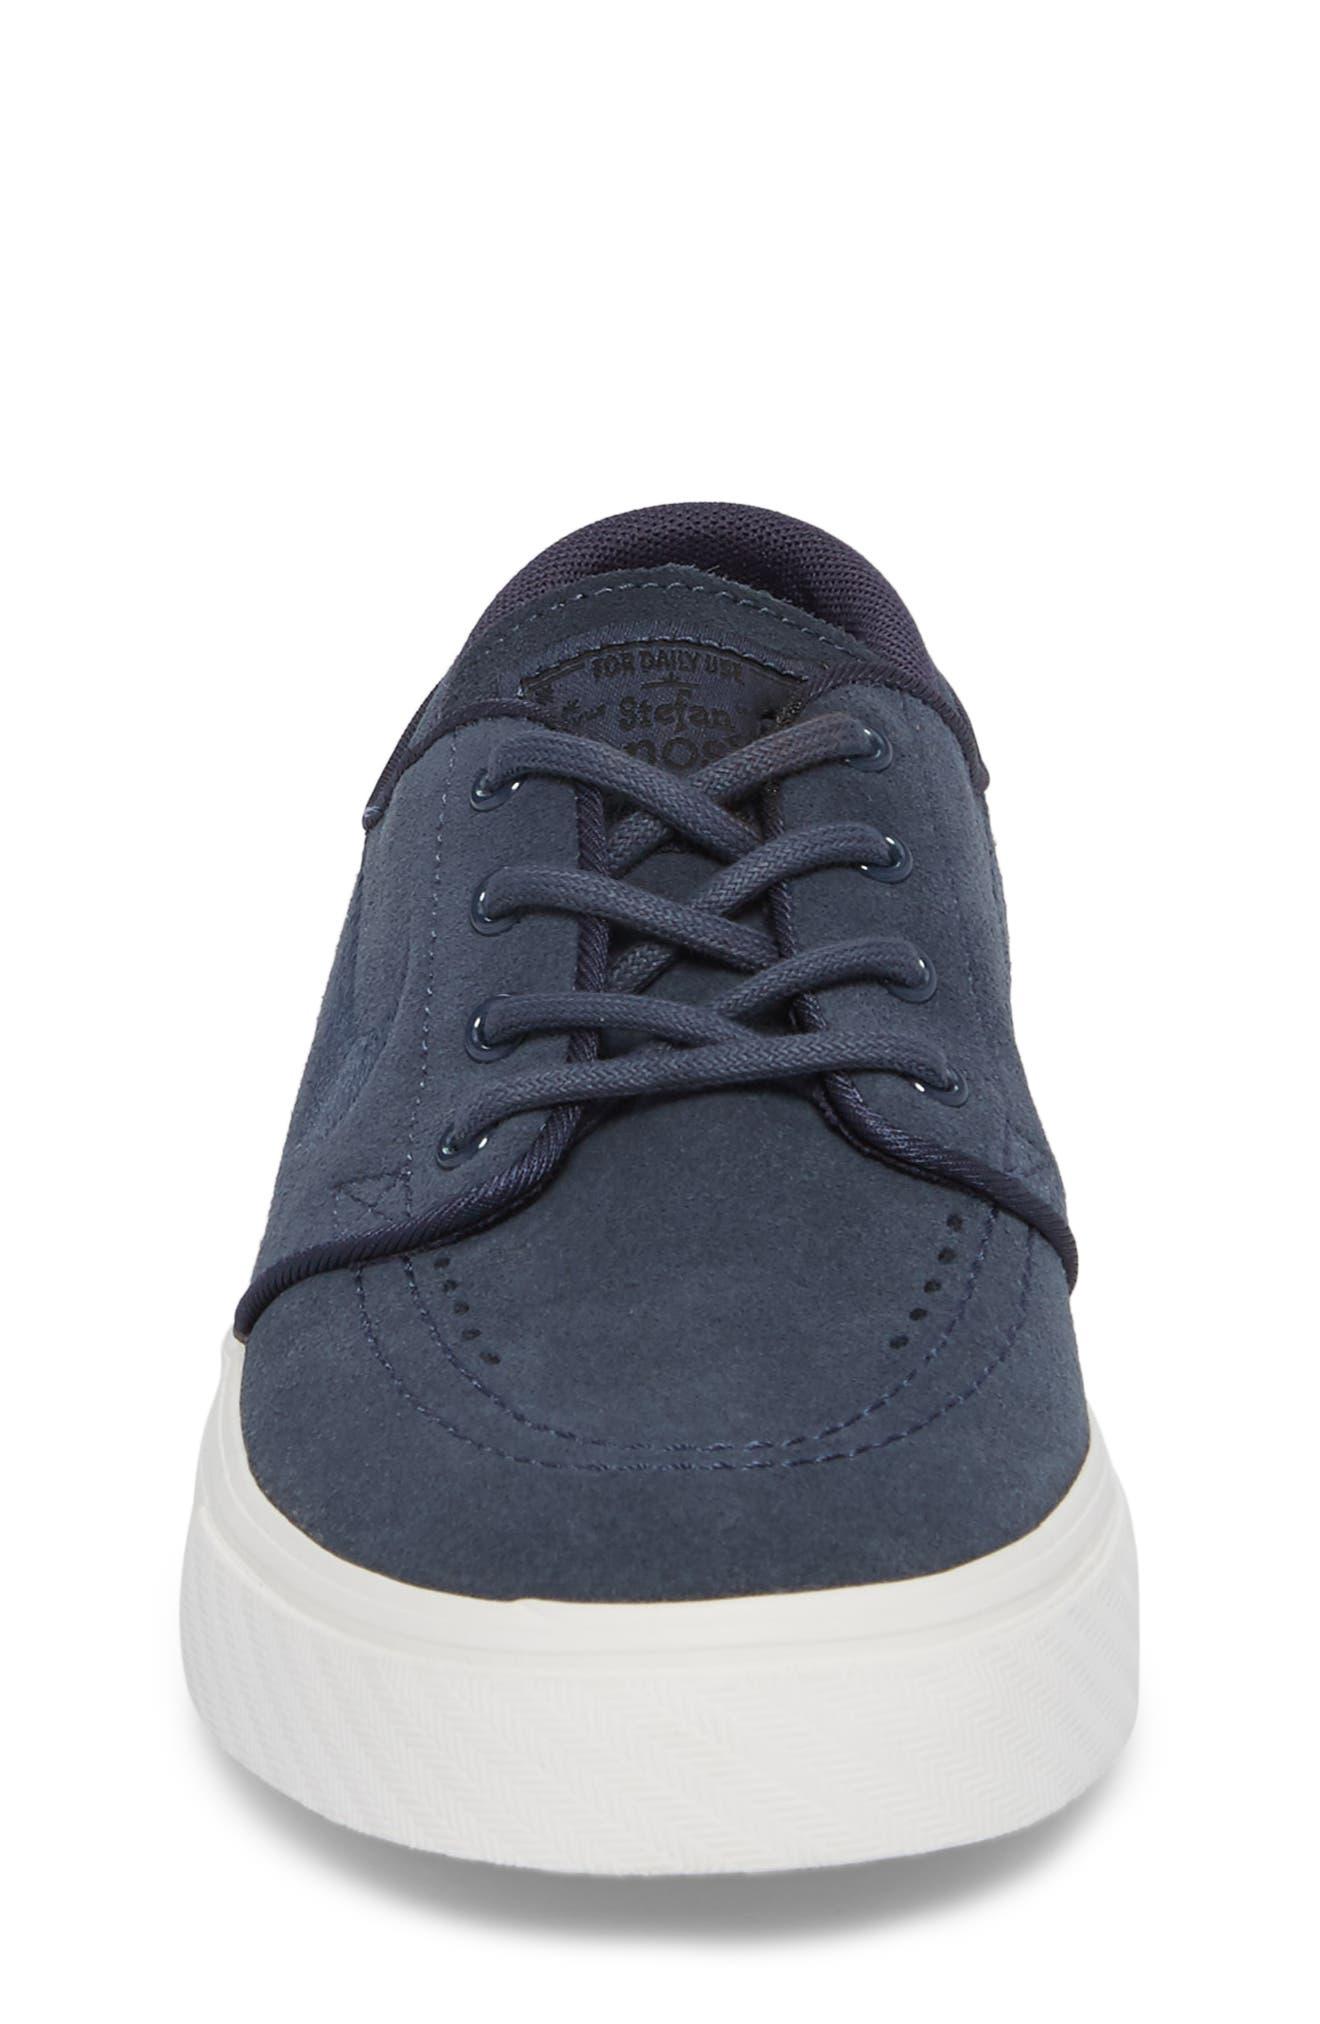 'Stefan Janoski' Sneaker,                             Alternate thumbnail 43, color,